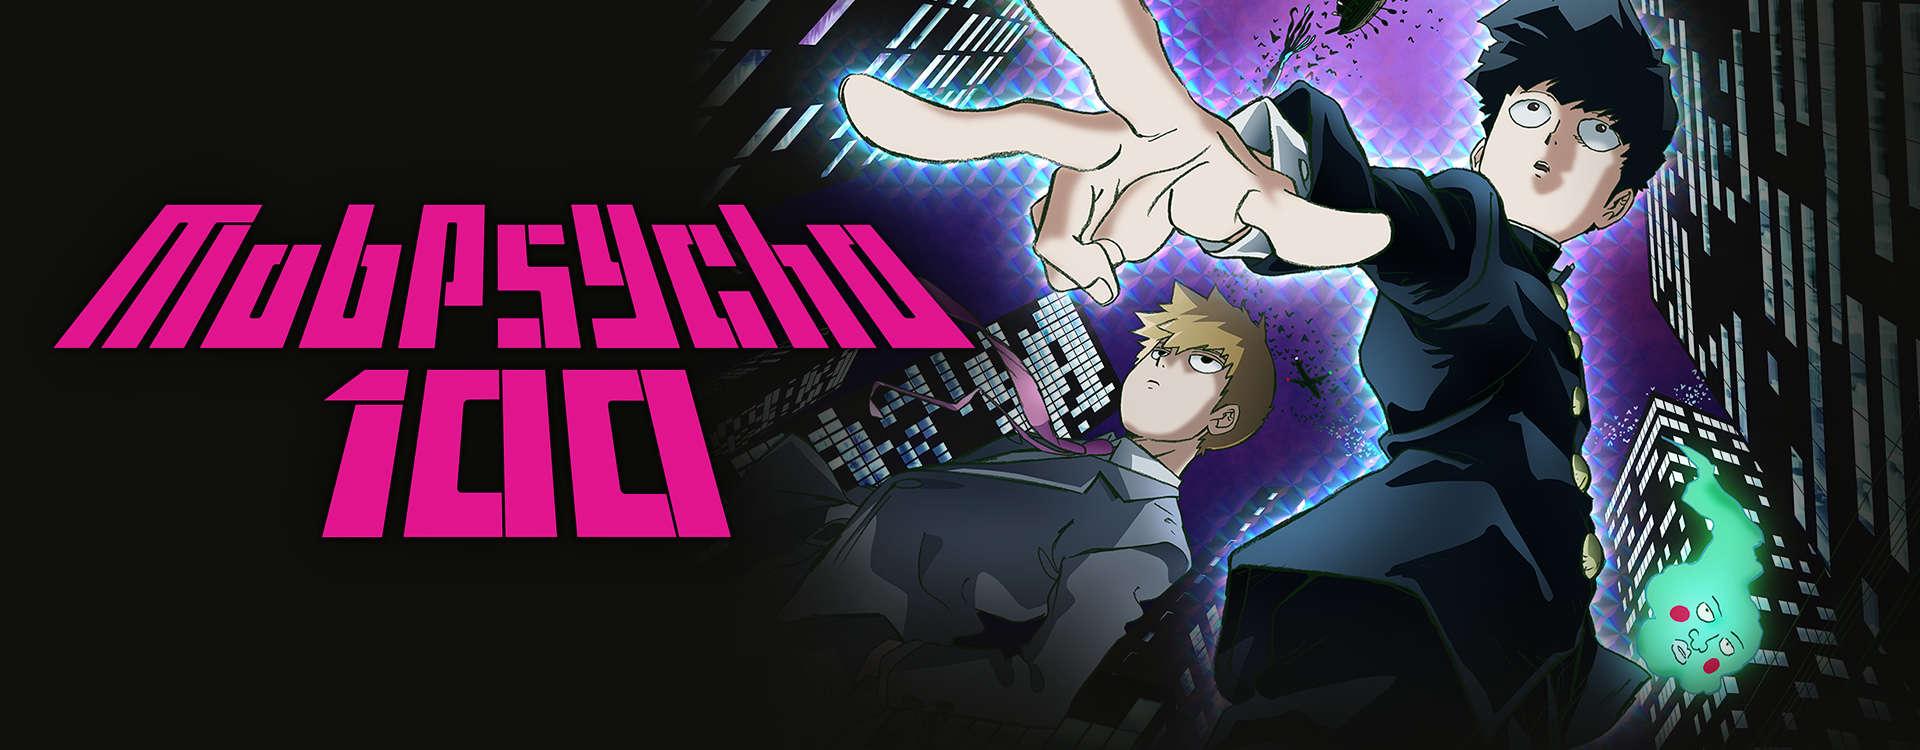 stream amp watch mob psycho 100 episodes online   sub amp dub